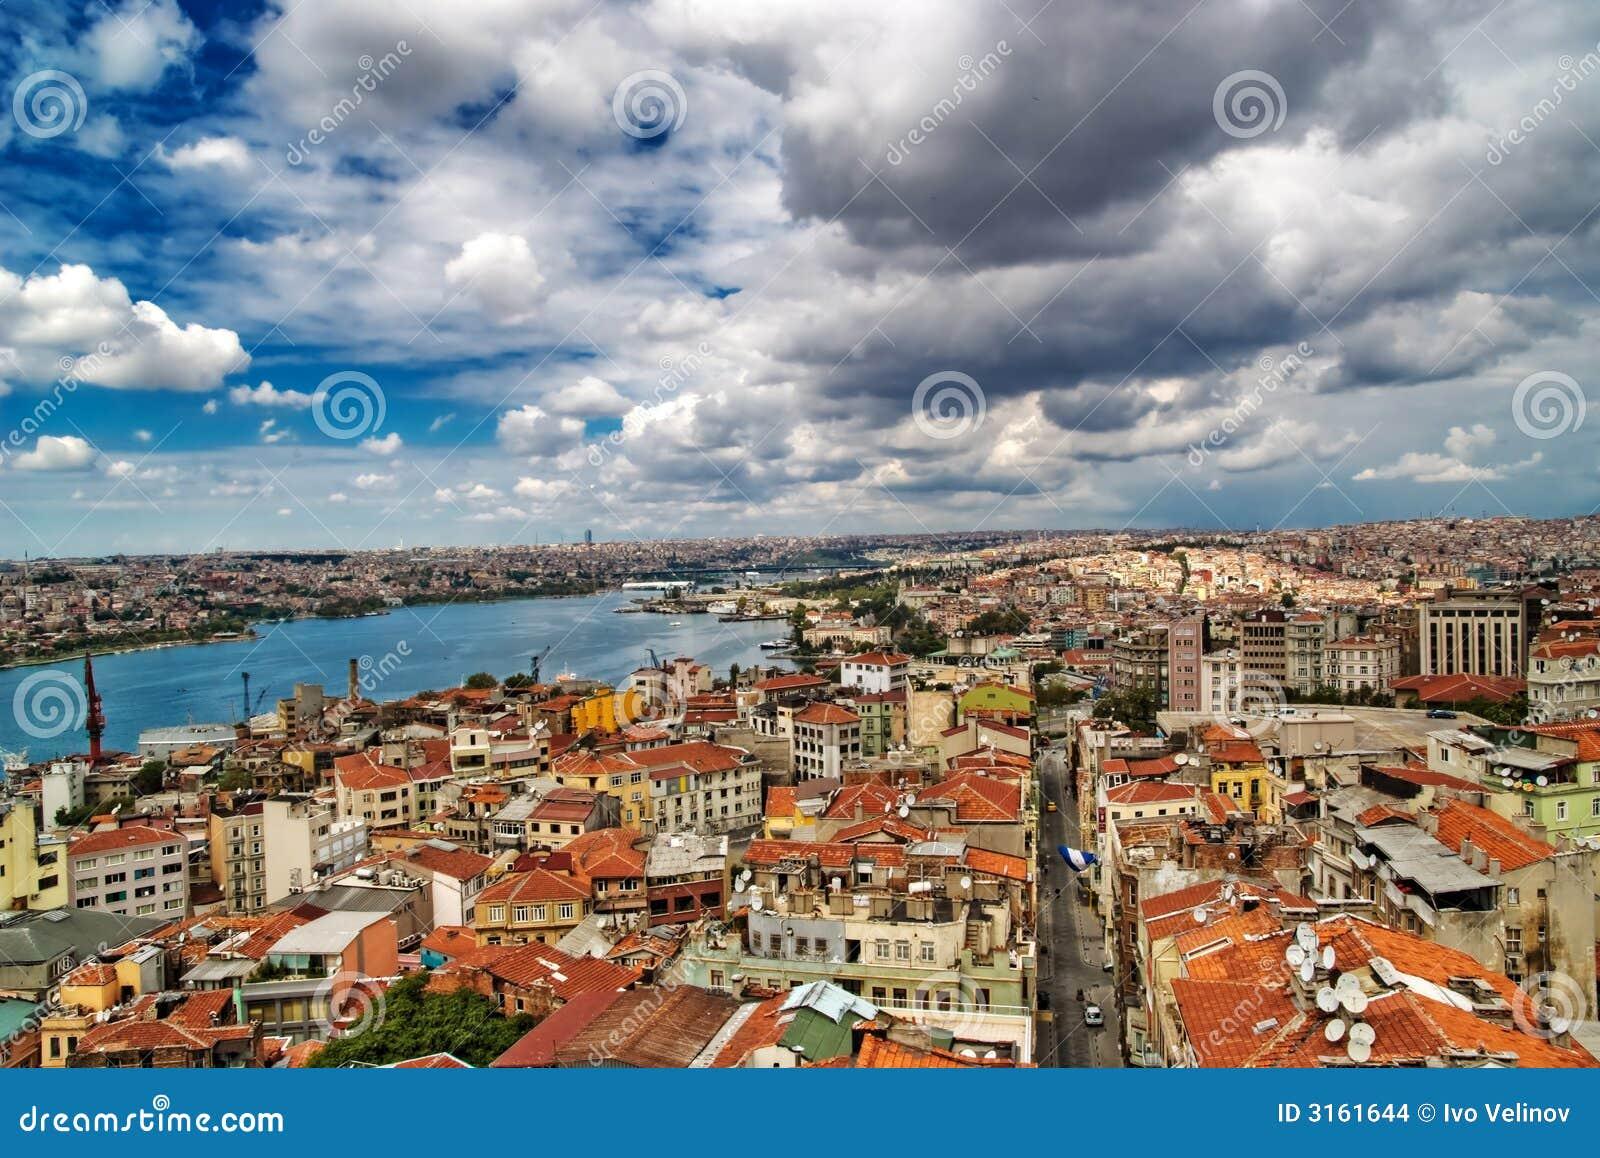 Golden Horn, Istanbul, Turkey Stock Photo - Image of ...